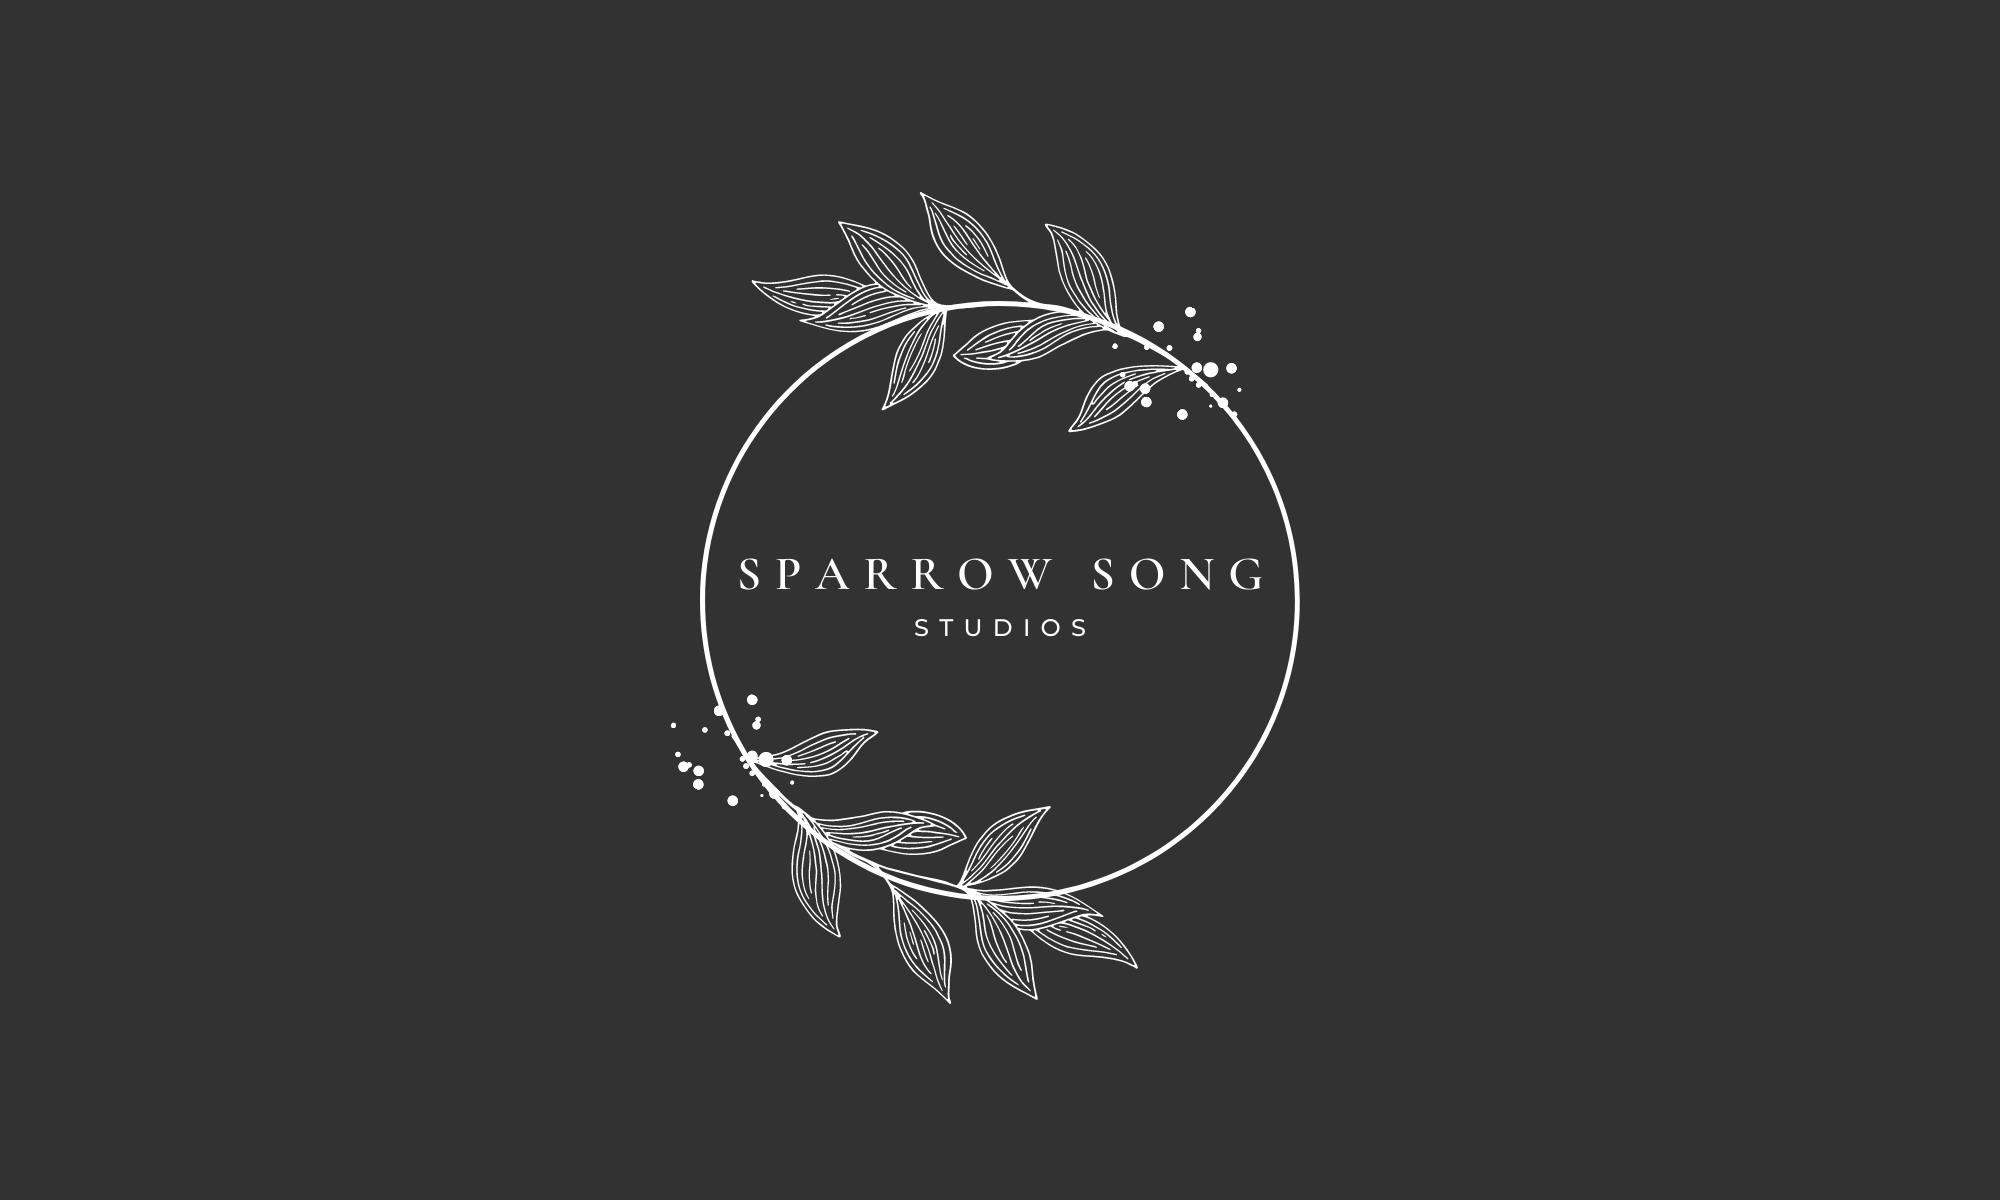 Sparrow Song Studios